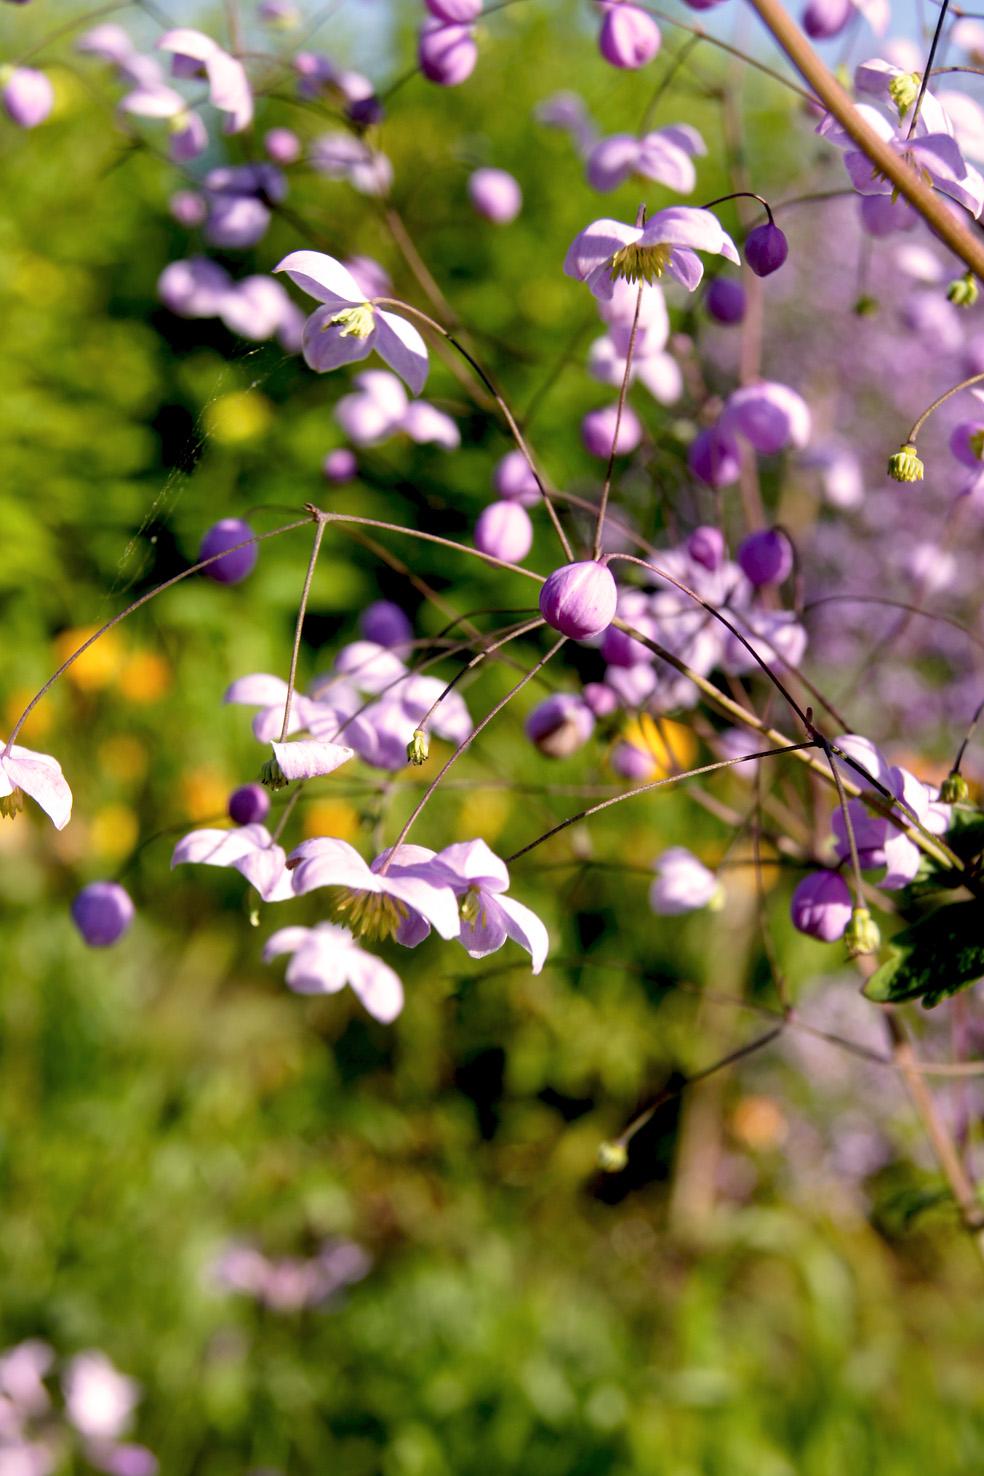 Thalictrum delavayi 'Splendid' (Wiesenraute)